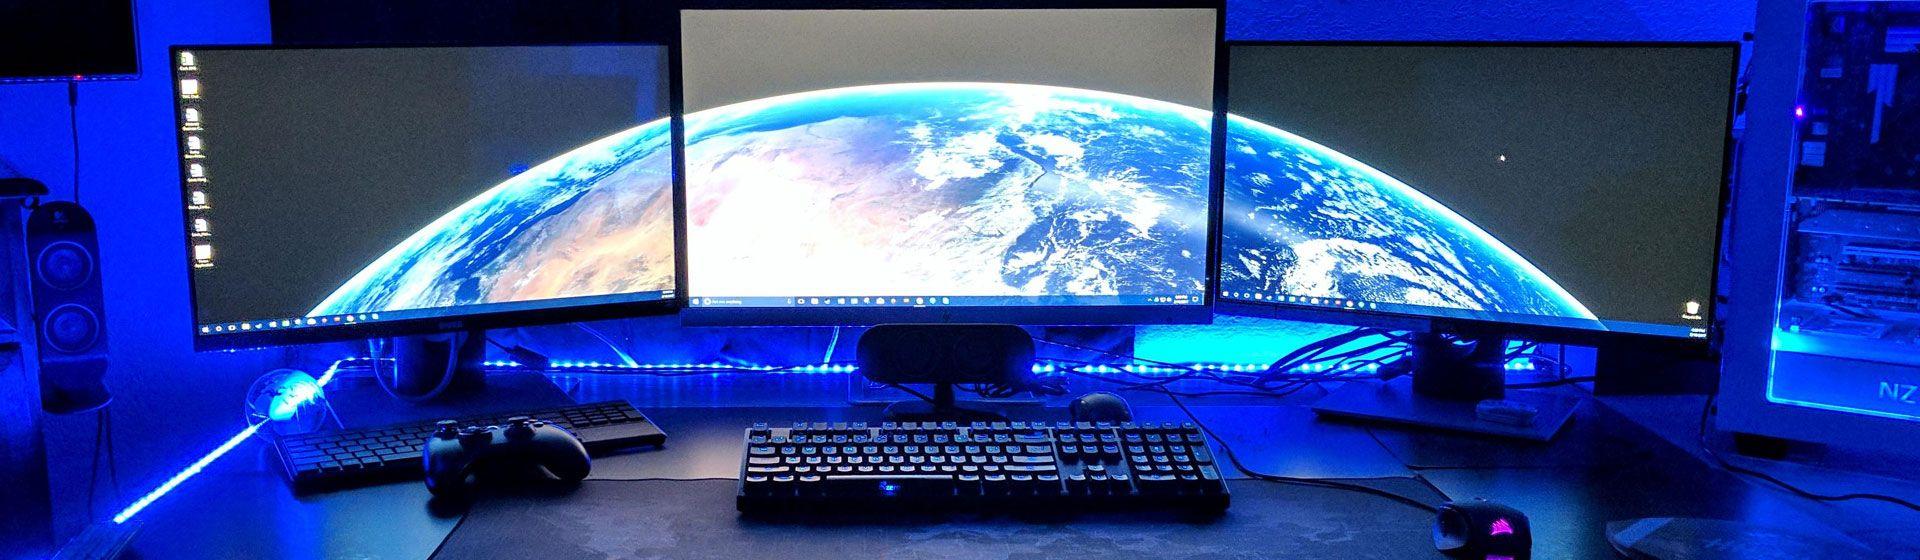 Como usar dois monitores no PC ou notebook?